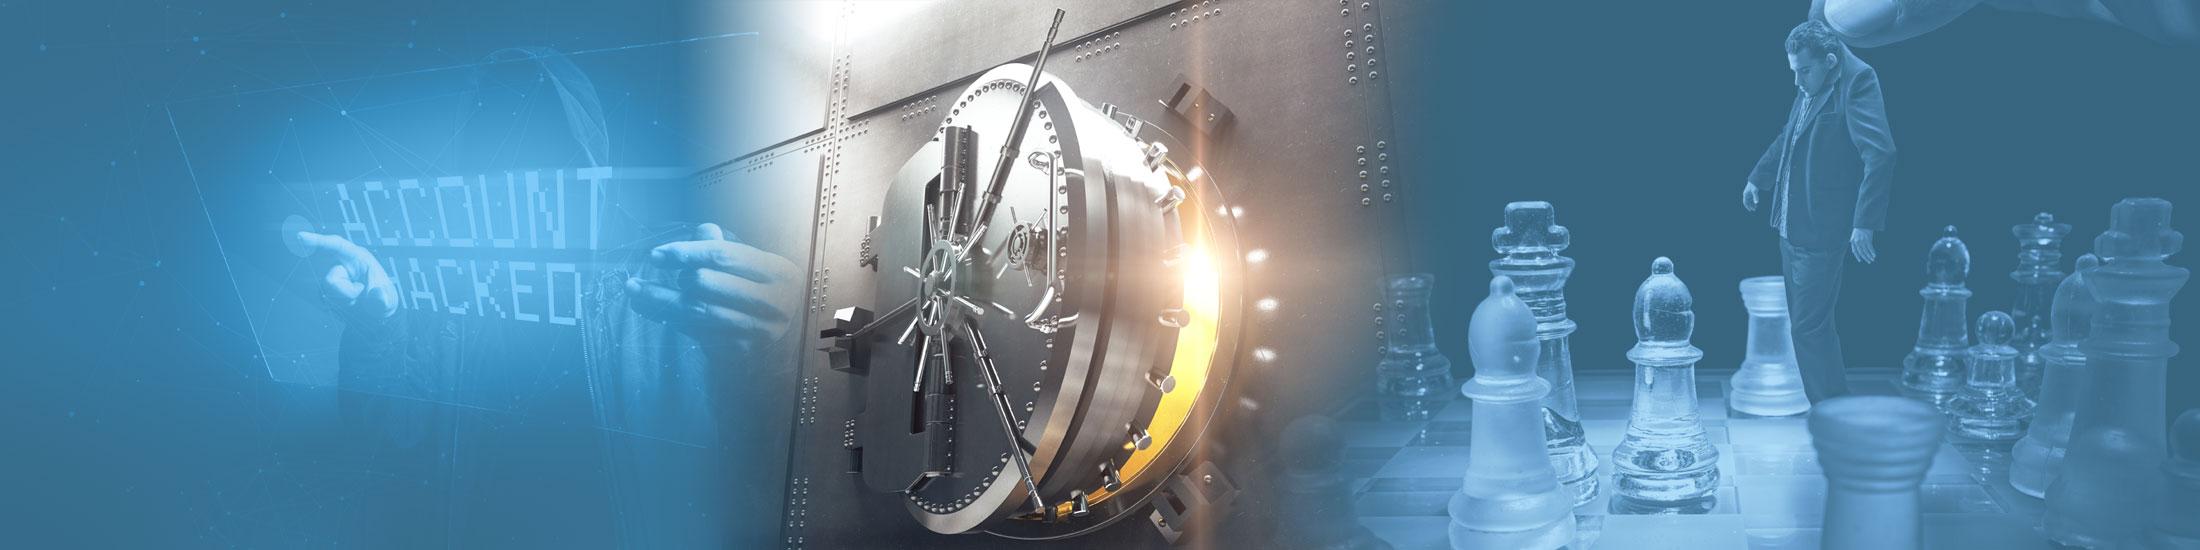 Banks Losing Battle in Criminal ATO Schemes